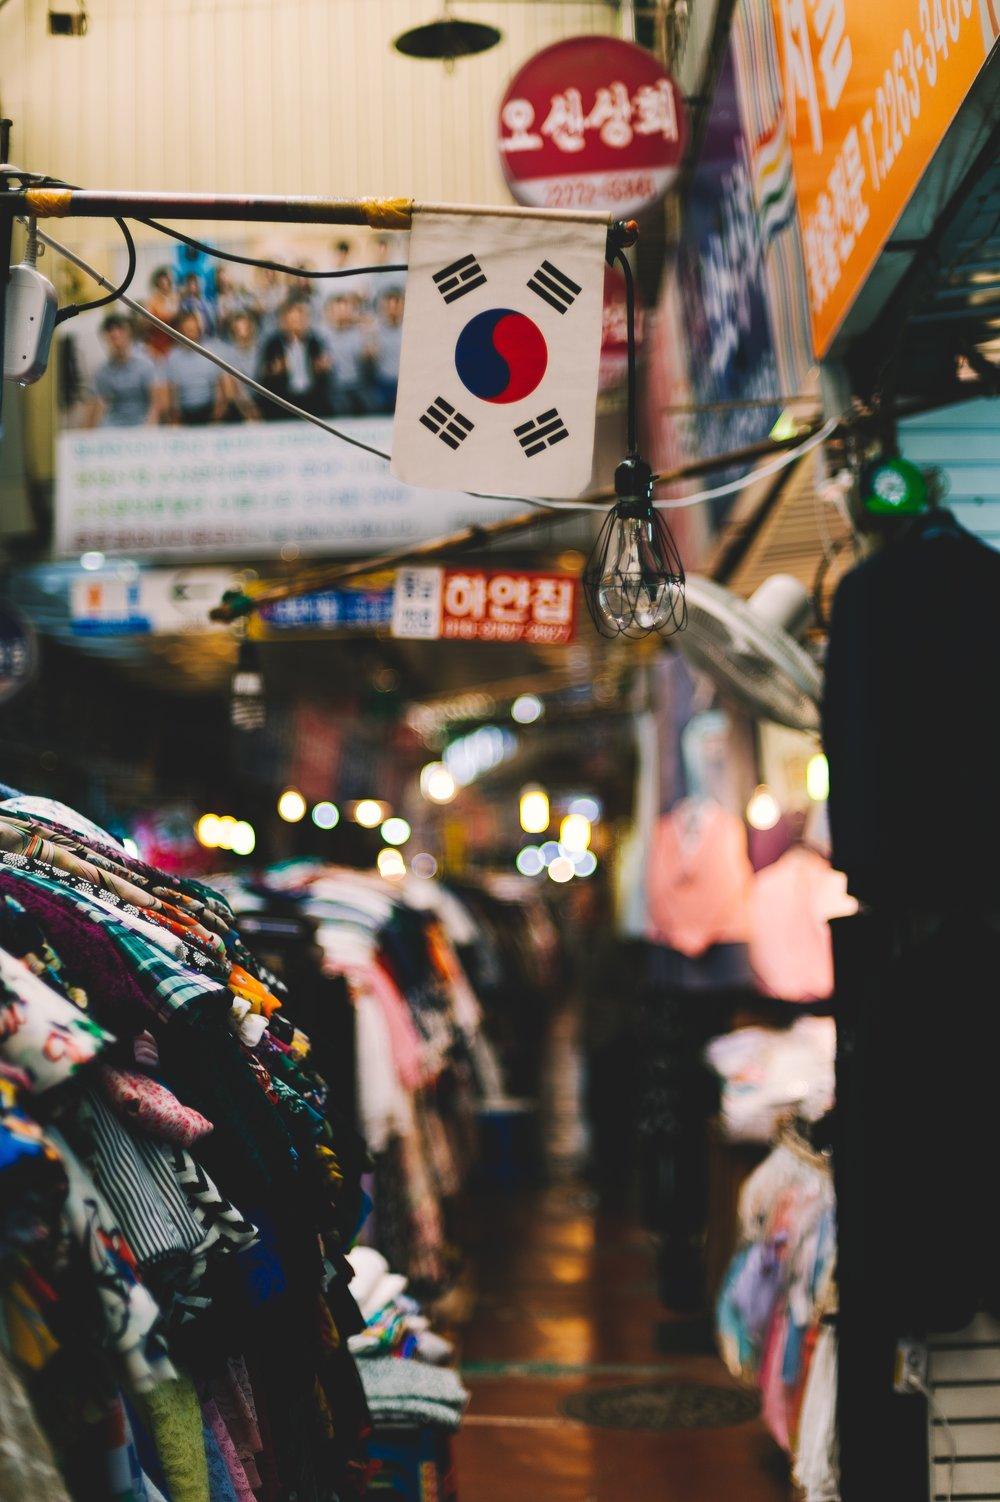 bundo-kim-693338-unsplash.jpg